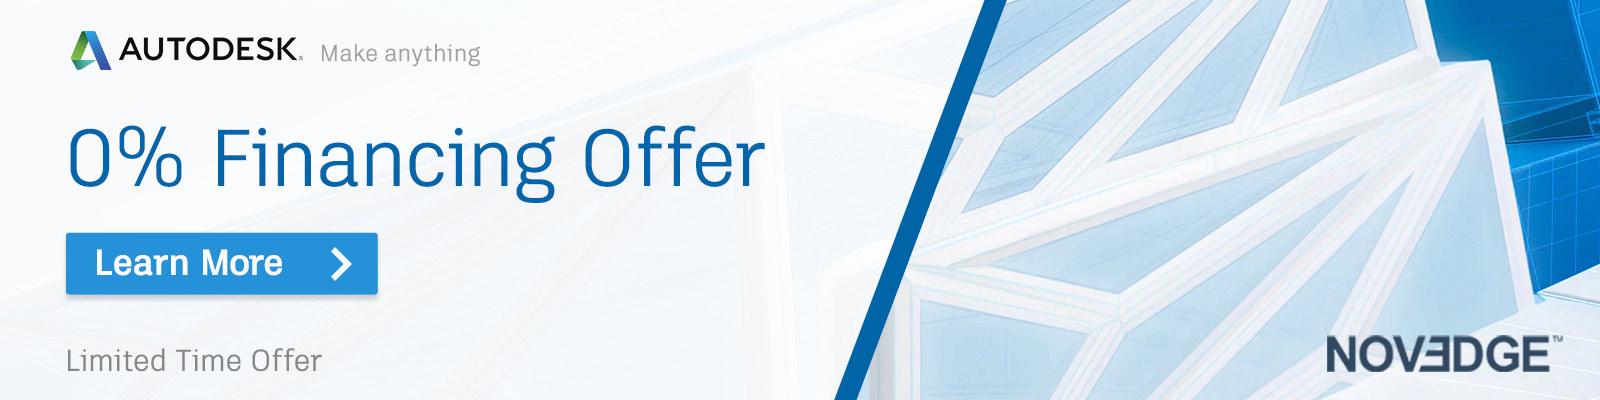 Autodesk 0% Financing Offer